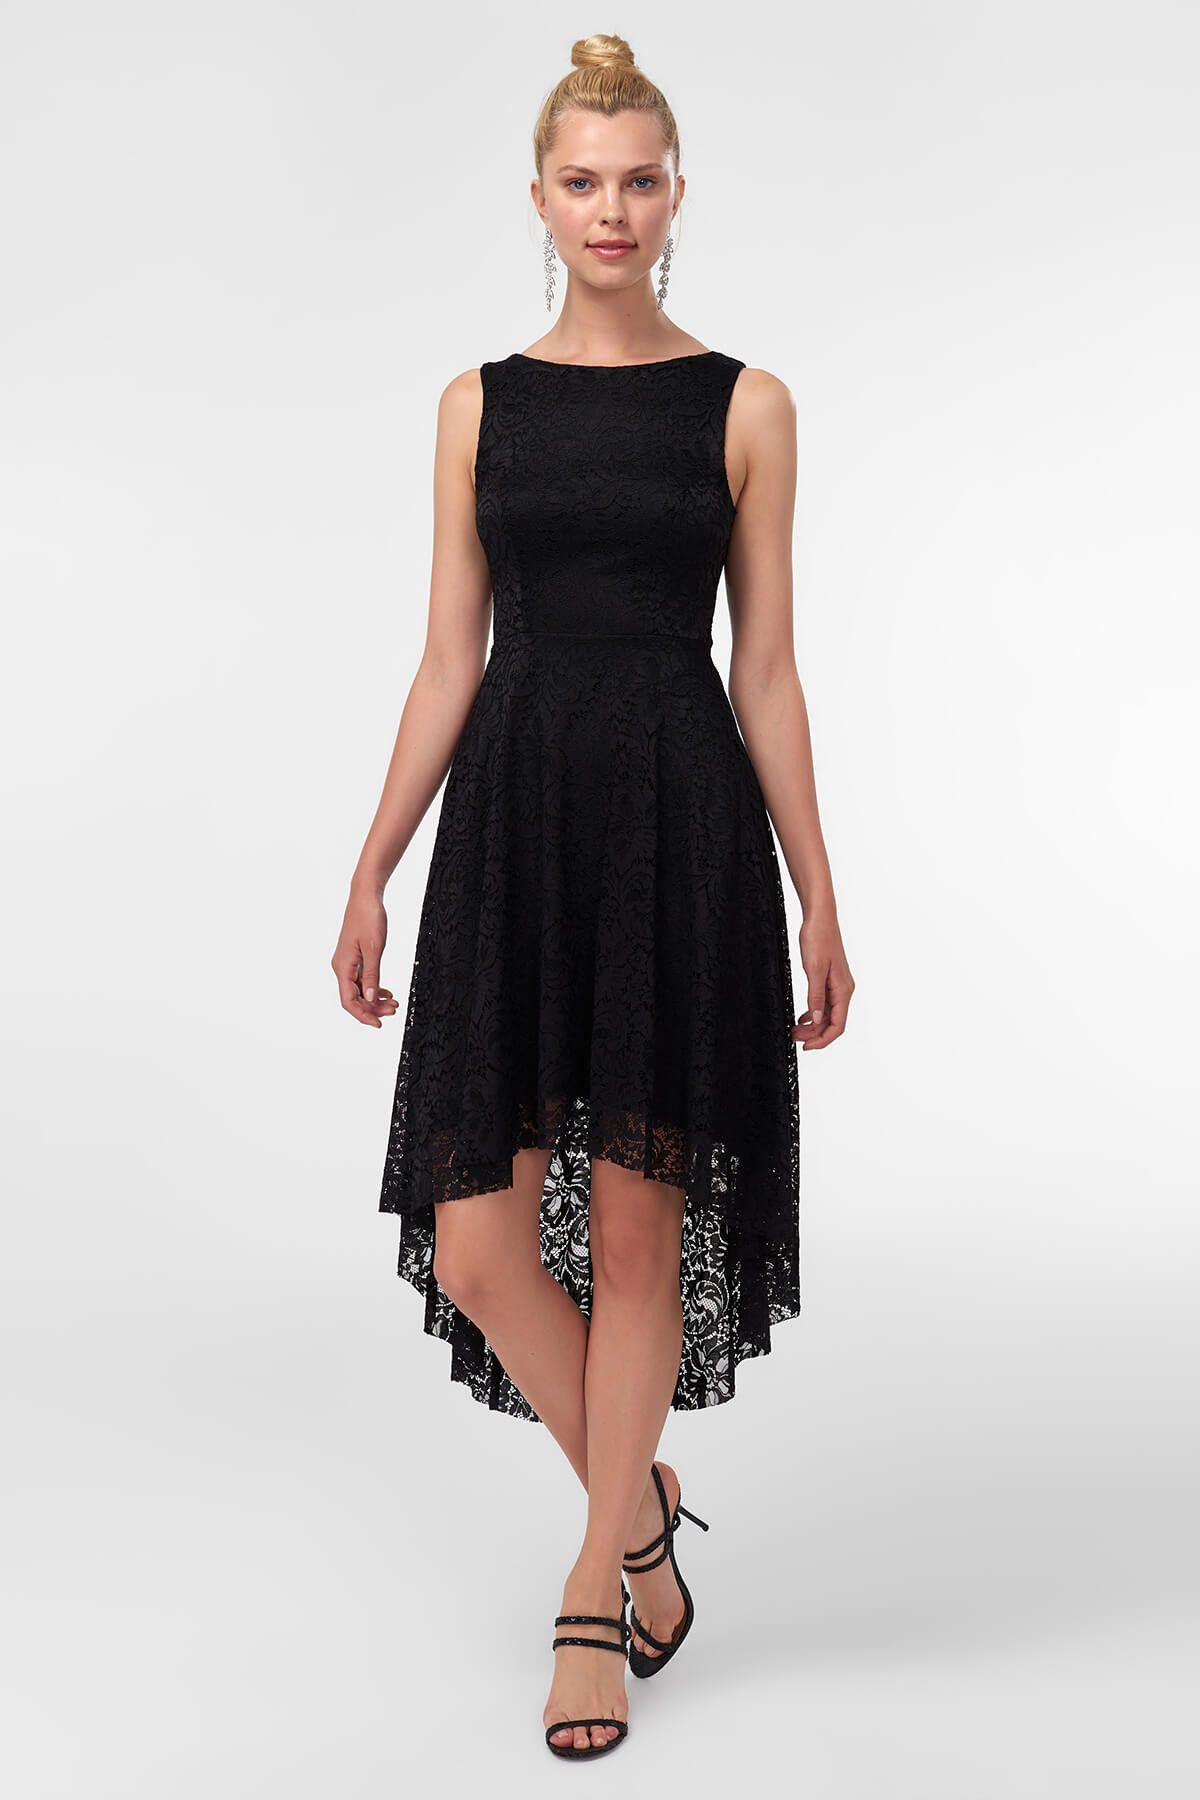 Siyah Dantel Detayli Abiye Elbise Tprss18yl0005 Trendyolmilla Trendyol Elbise Kiyafet Elbise Modelleri